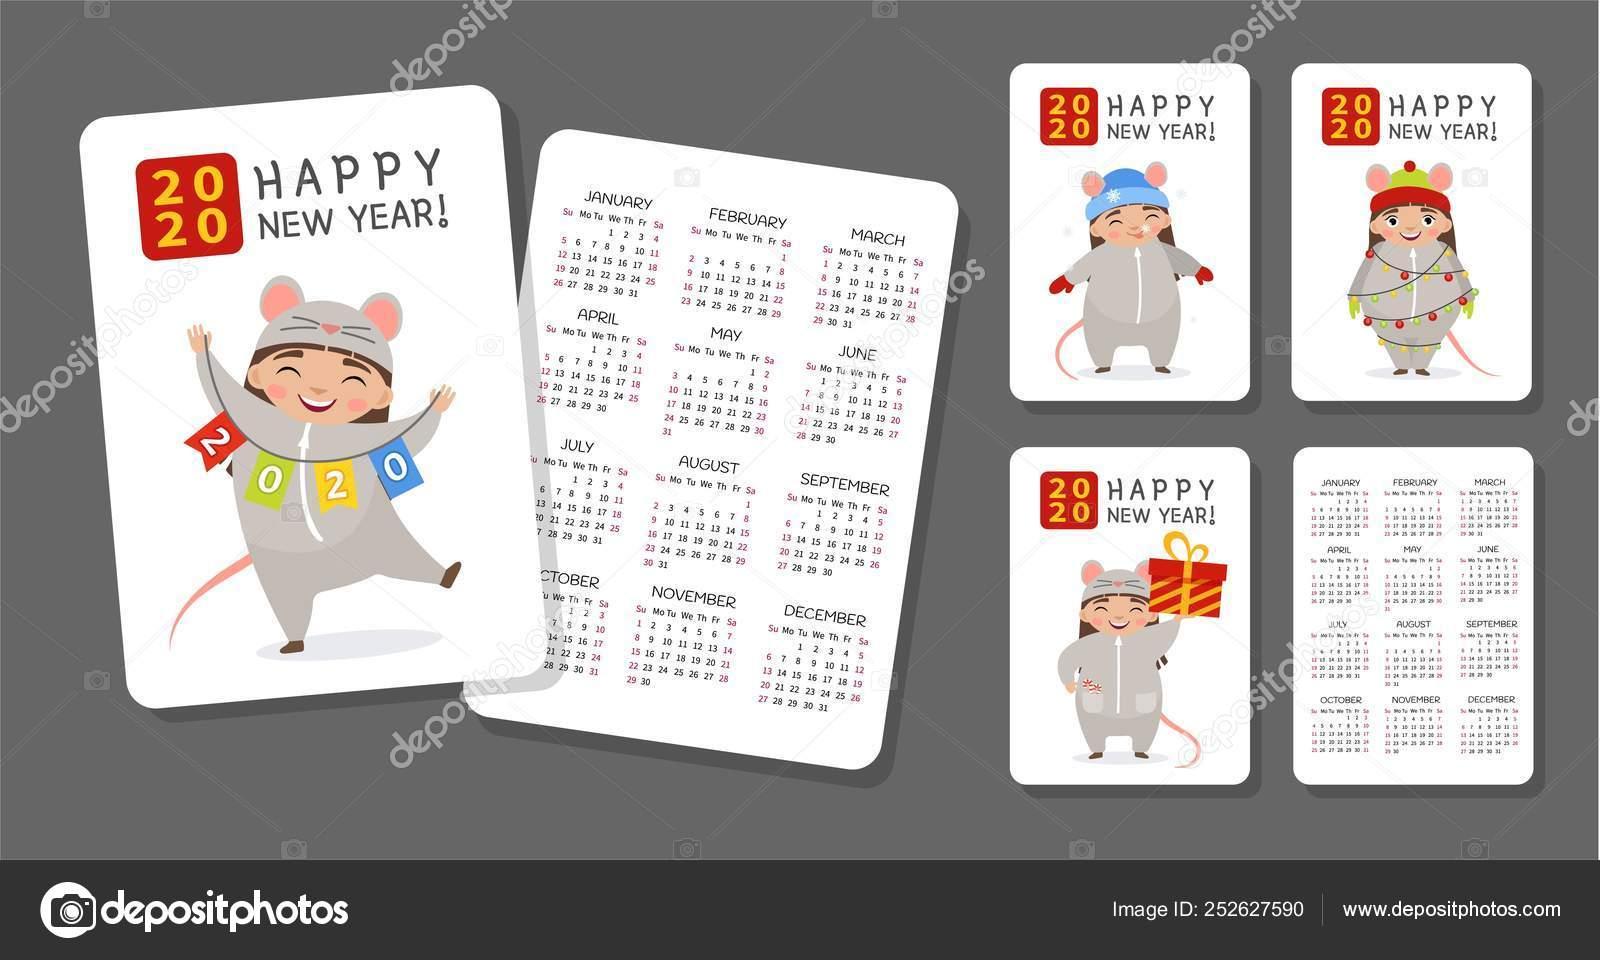 Pocket Alendar 2020 Cute Monthly Calendar Girl Mouse Costume